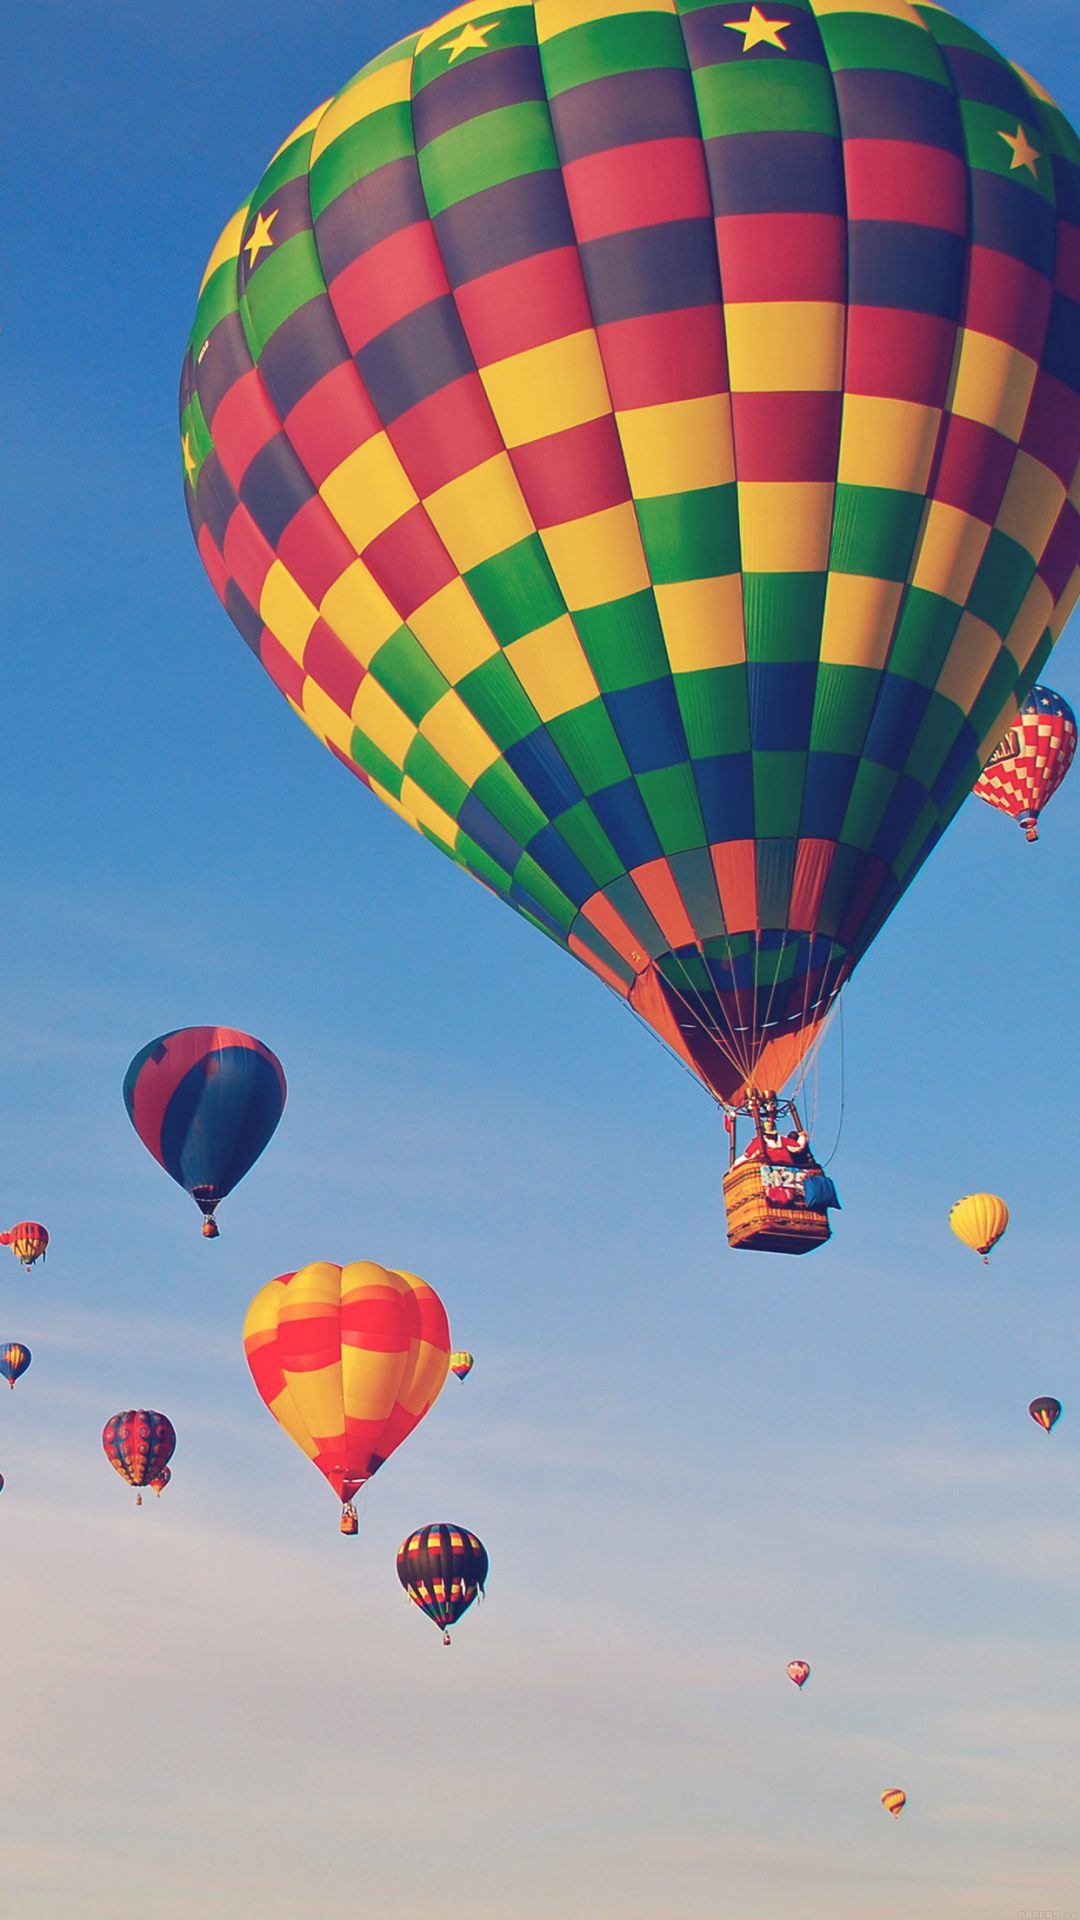 Hot Air Balloon Party Nature Sky